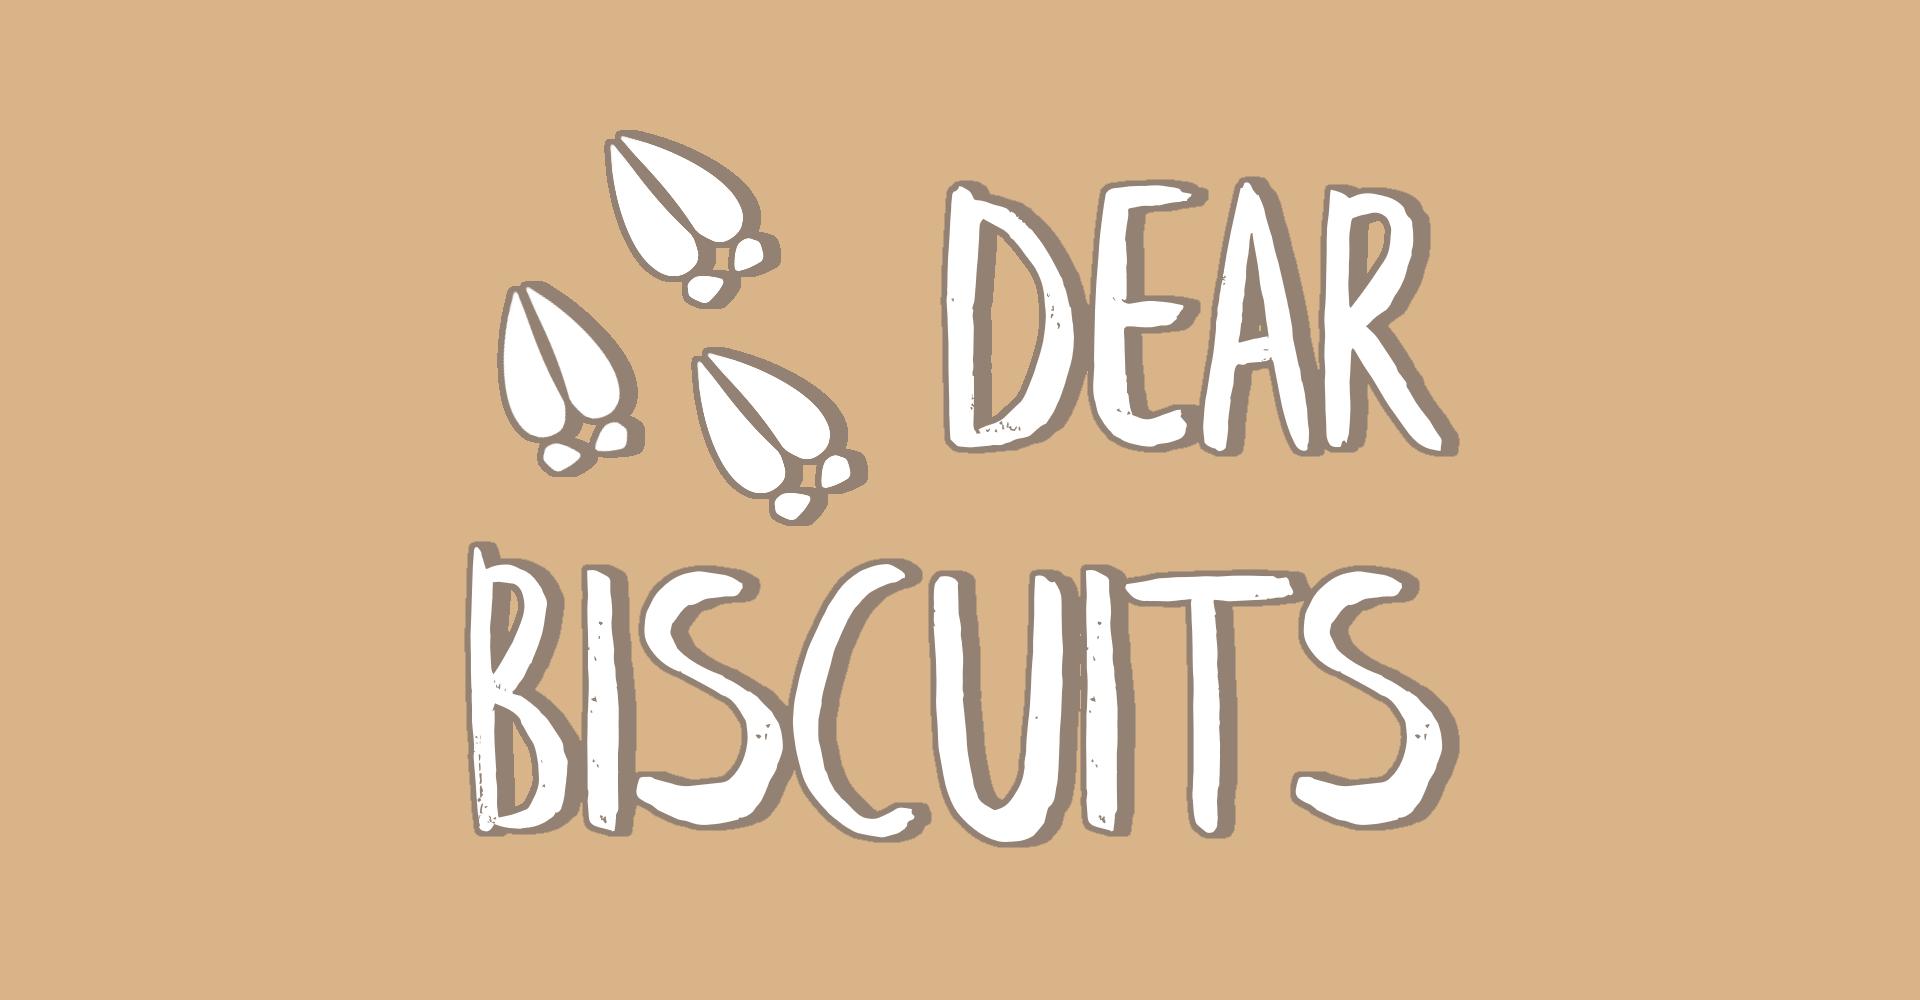 Dear Biscuits